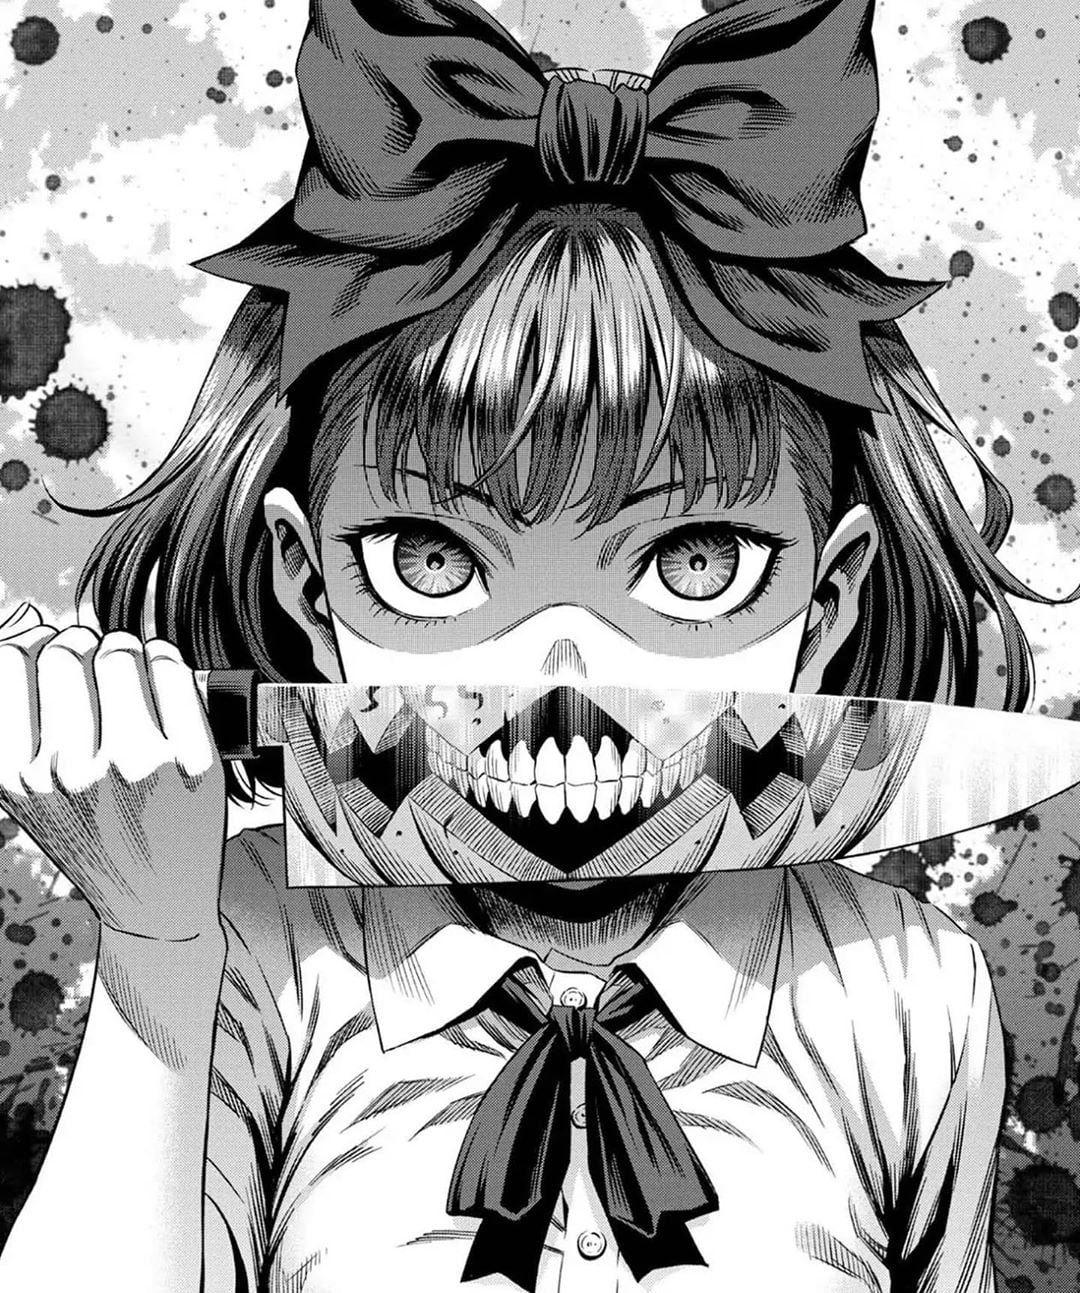 Manga Anime Gore Knife Dark Low Saturation Monochrome Black White Anime Girls Psycho Psychonauts 720p Wal Dark Anime Anime Wall Art Anime Wallpaper